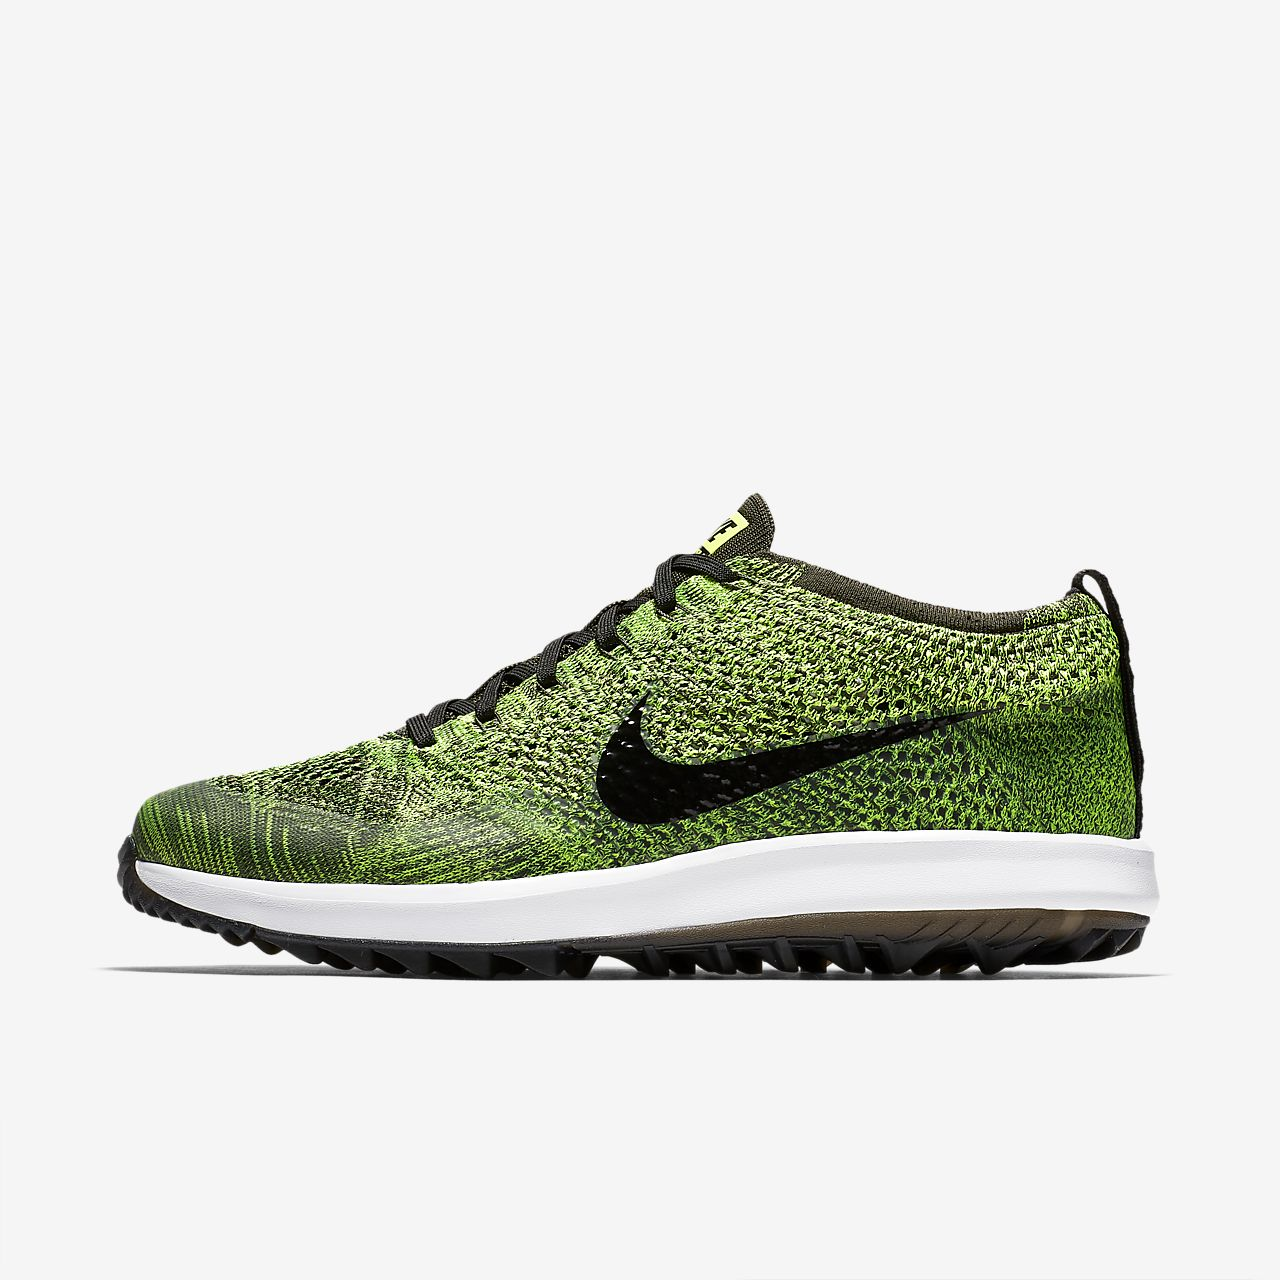 63622557e93c Nike Flyknit Racer G Men s Golf Shoe. Nike.com CA